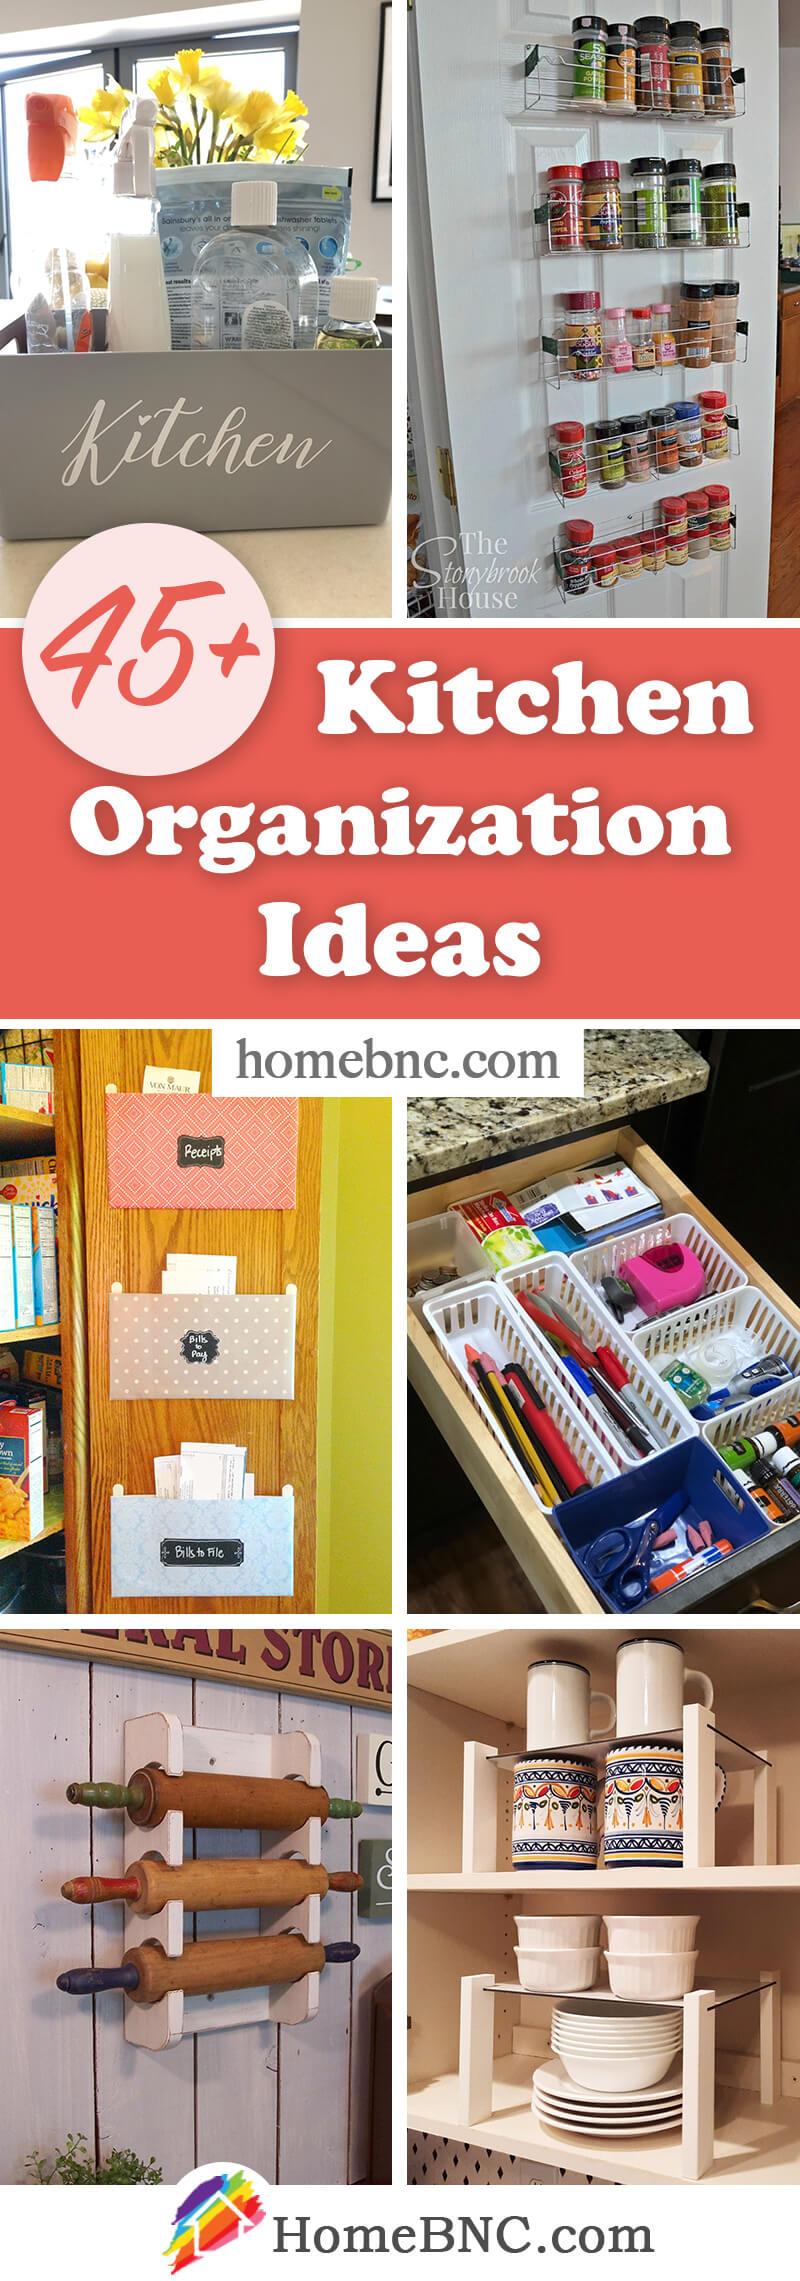 itchen Organizing Ideas